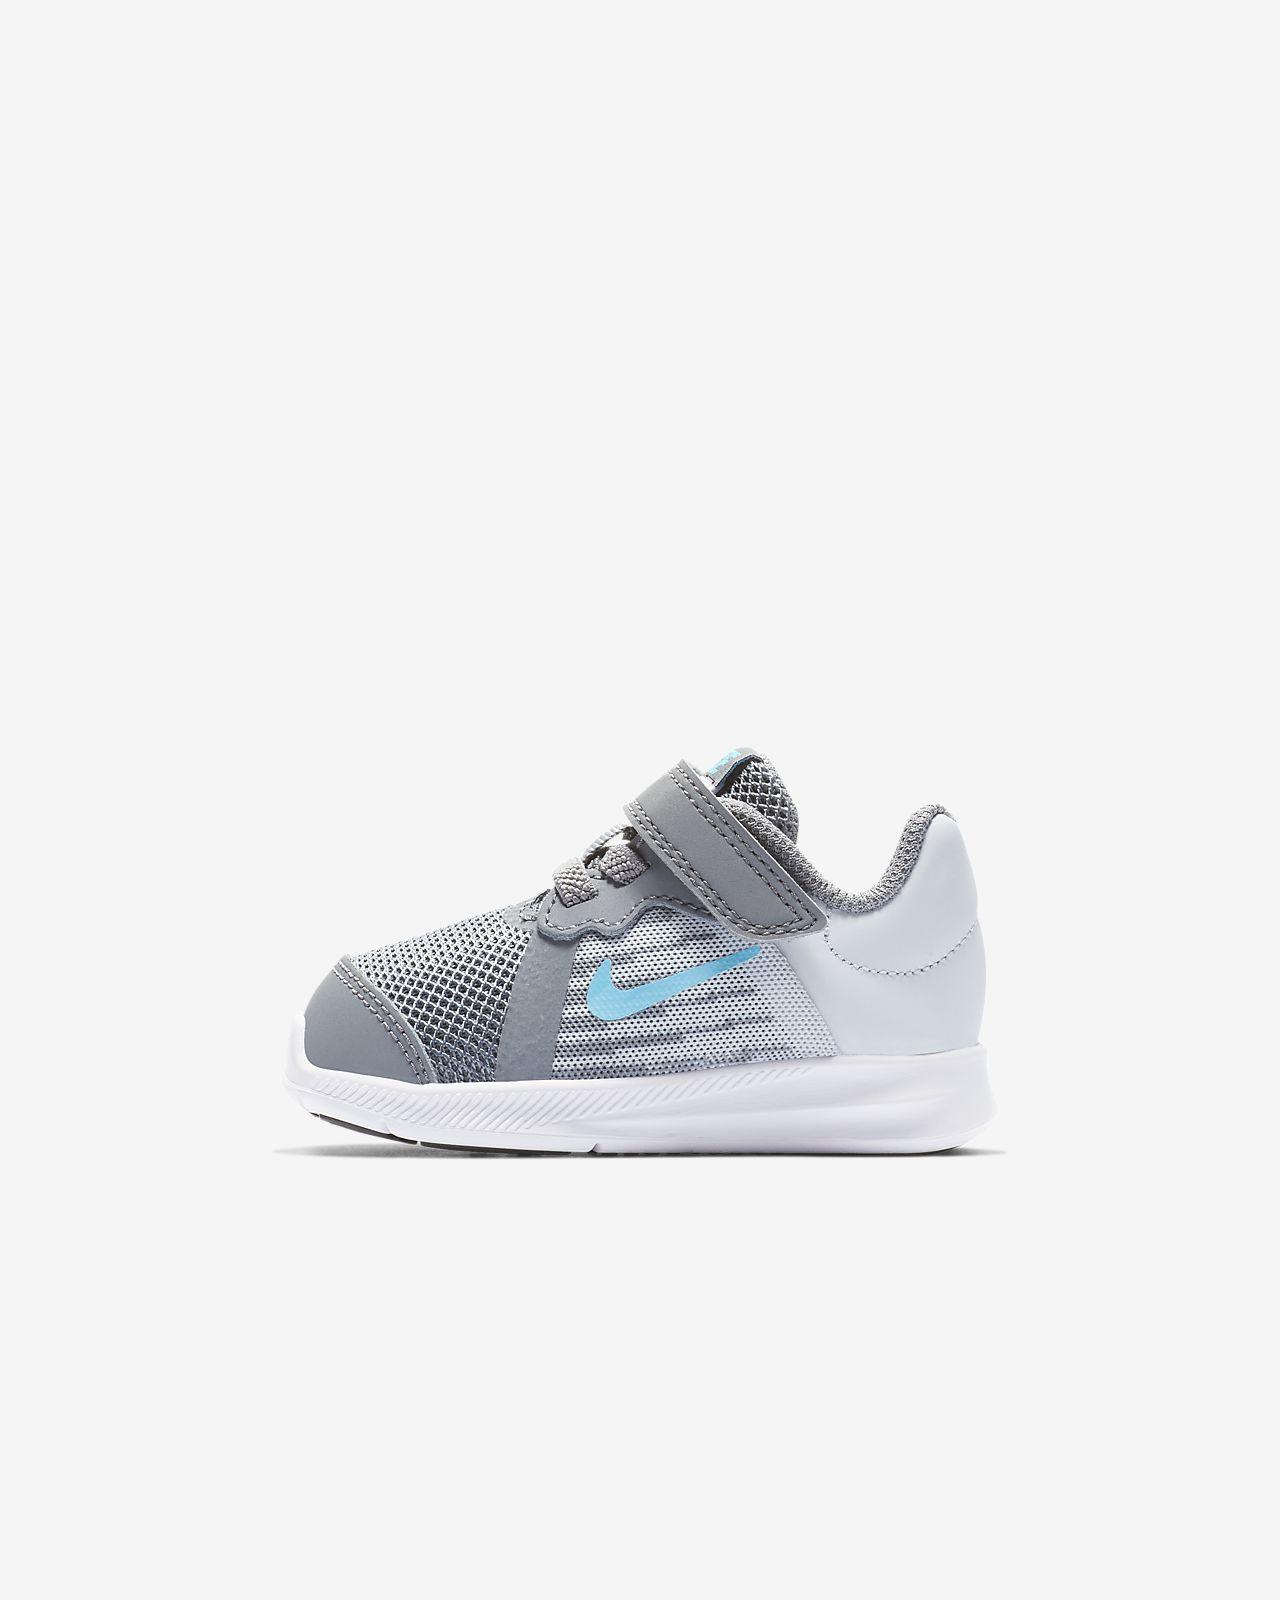 5339b9bc8c Nike Downshifter 8 Baby & Toddler Shoe. Nike.com AU